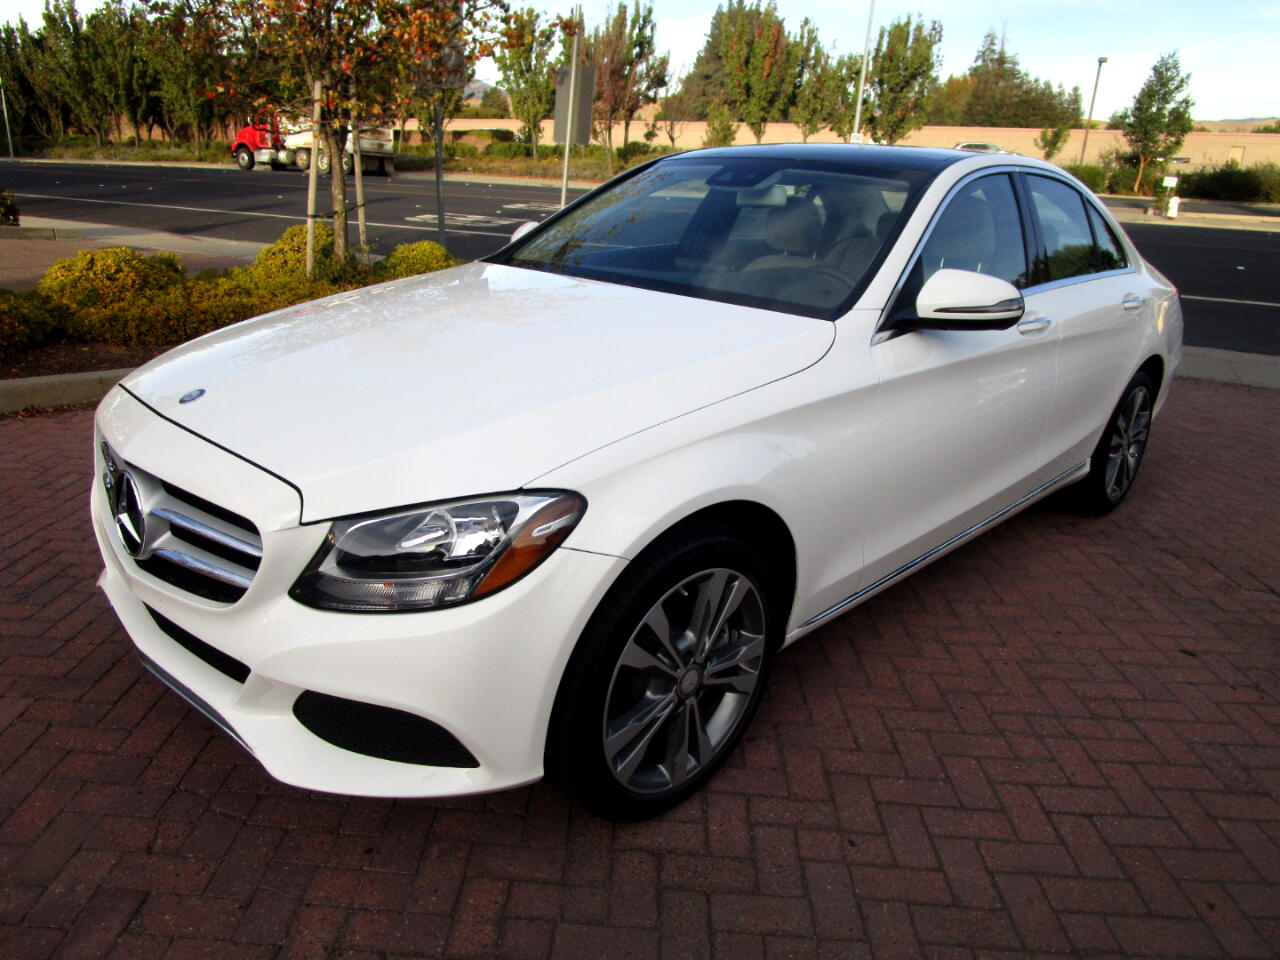 2016 Mercedes-Benz C300 4MATIC*P1 PKG*PANO*HEAT SEATS*SAT RADIO*REAR CAMER